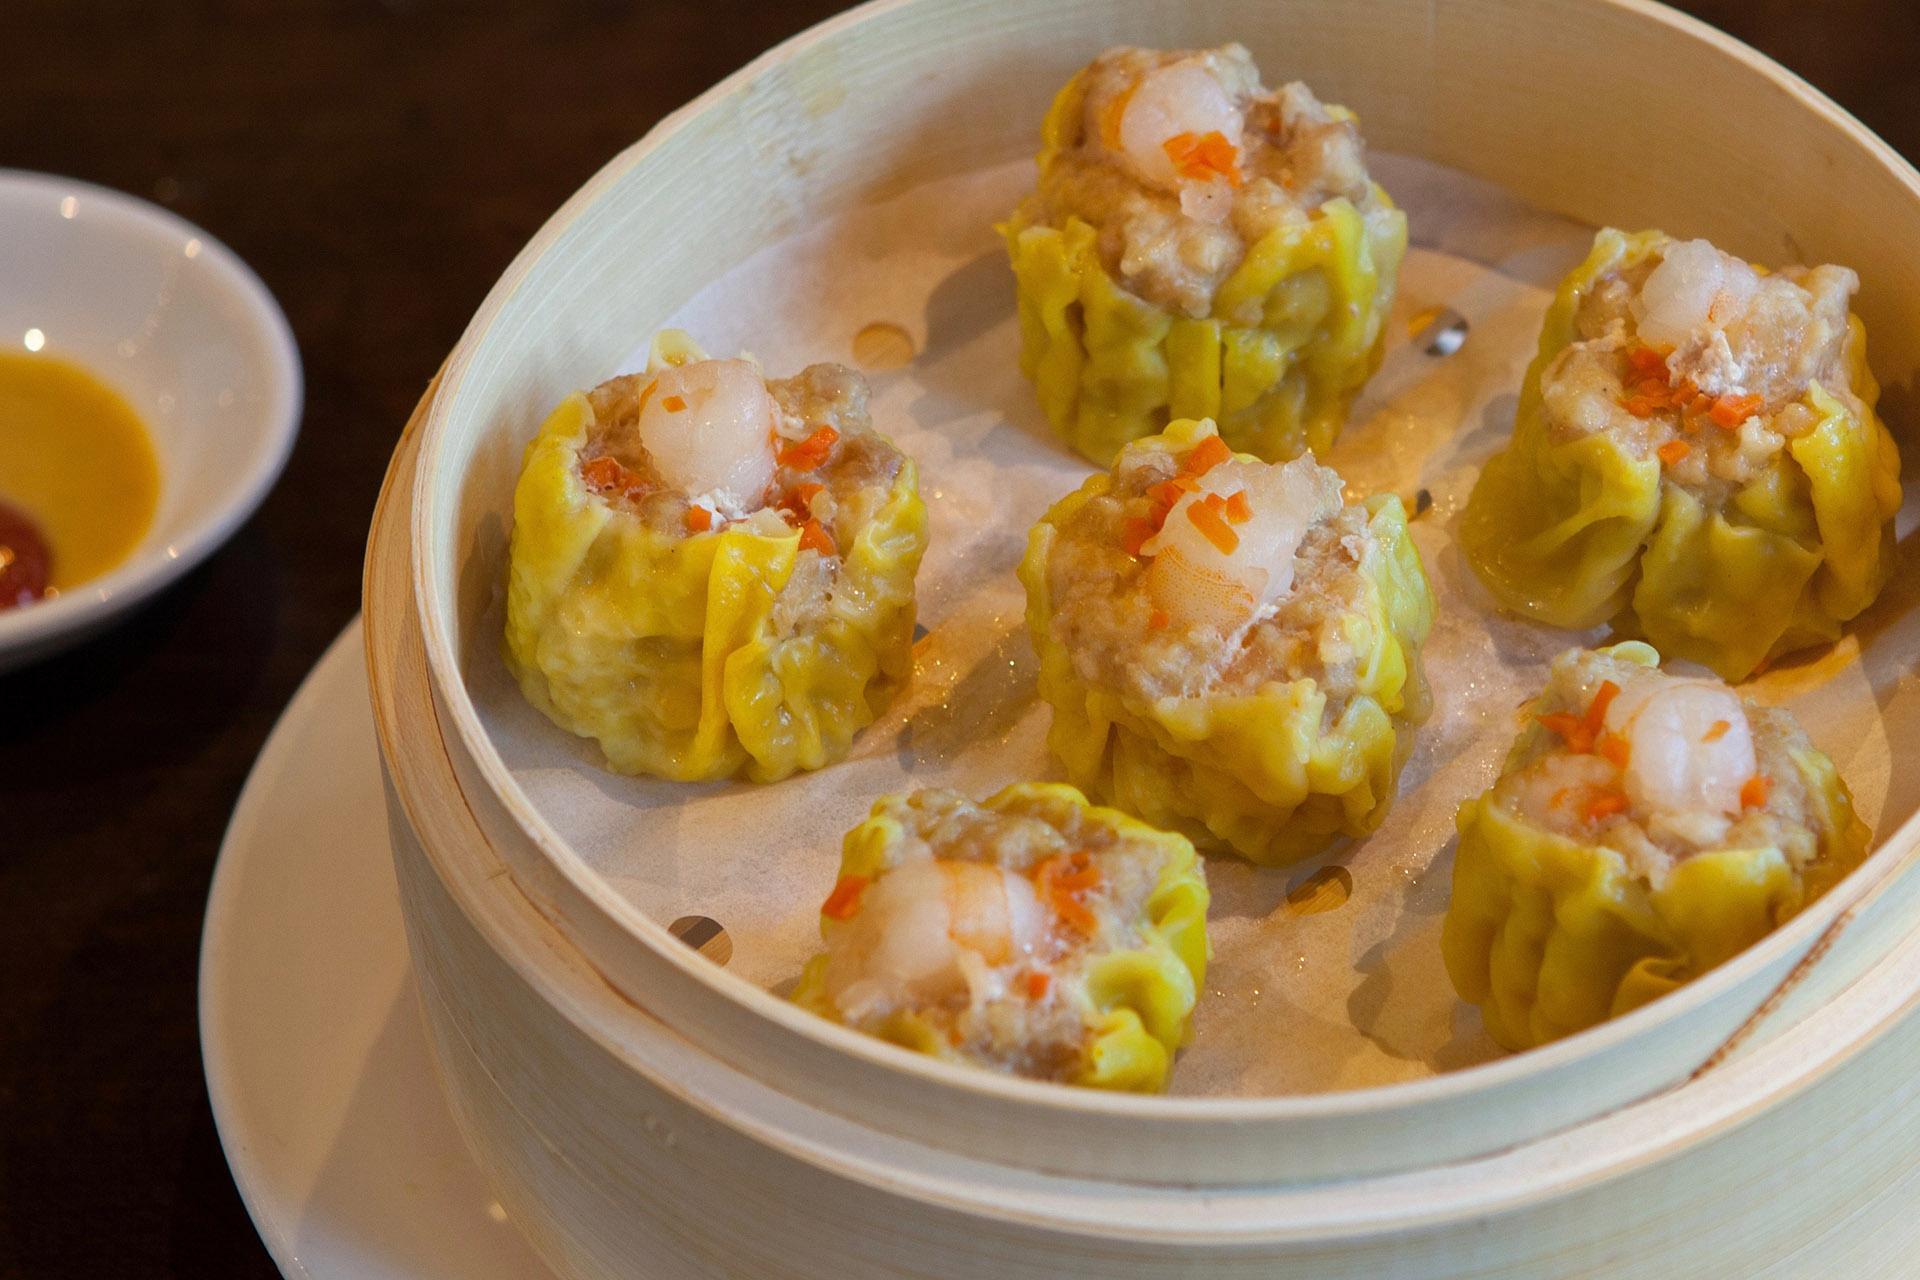 Shrimp & Chicken Shao Mai [6] at Lee Chen Asian Bistro